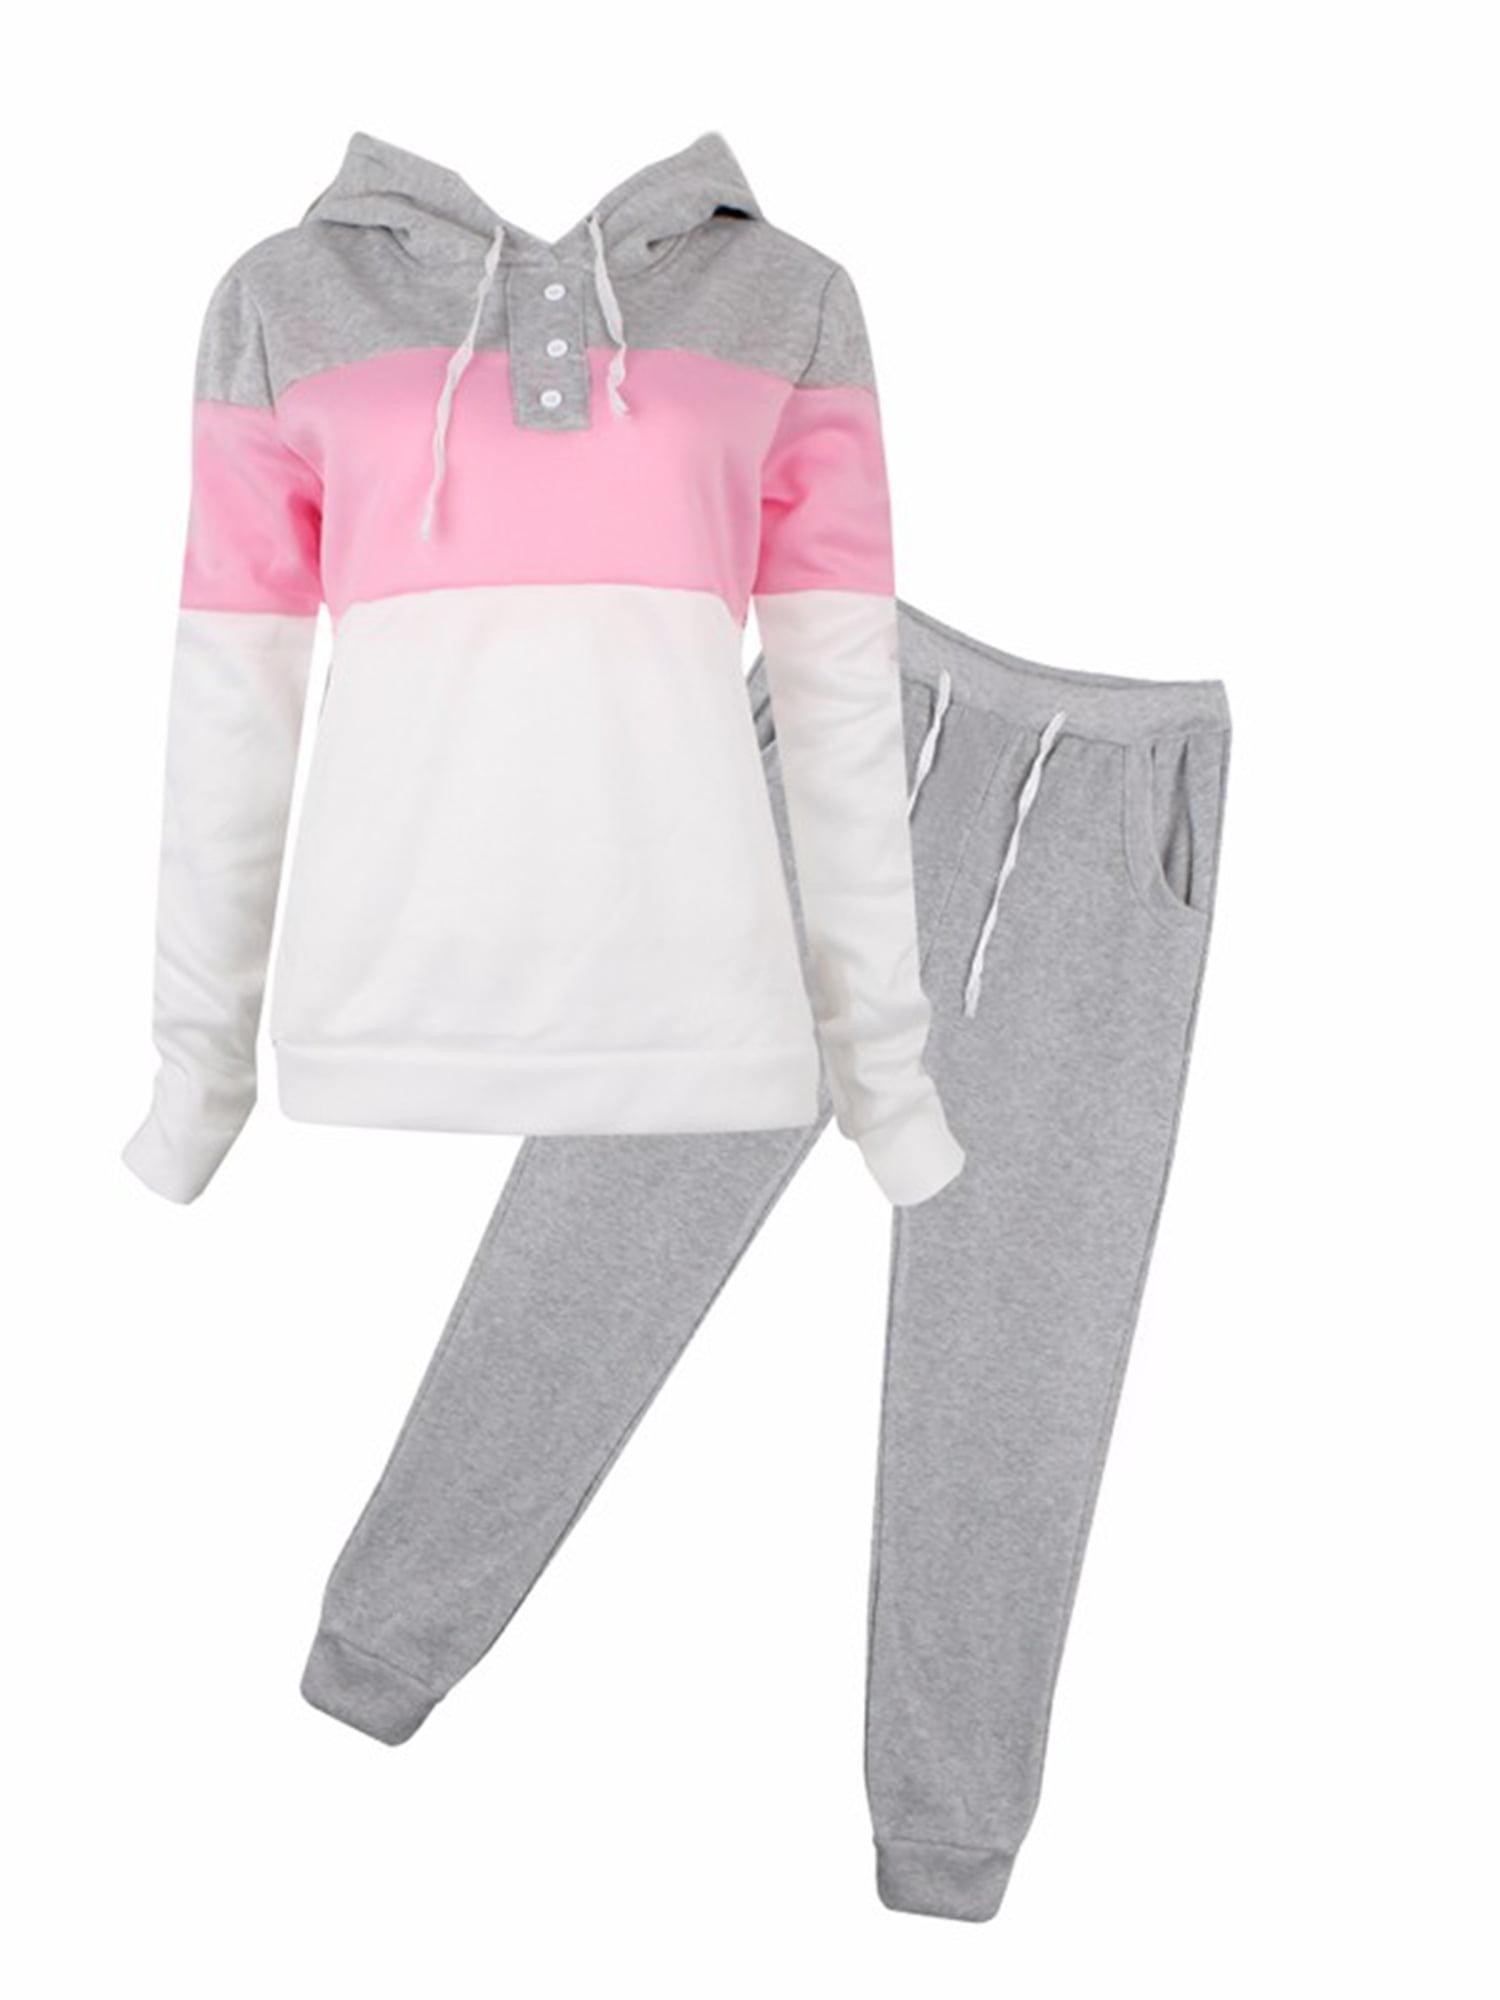 Women Tracksuit Set Hoodie Sweatshirt Jogger Fitness Sports Activewear Loungwear